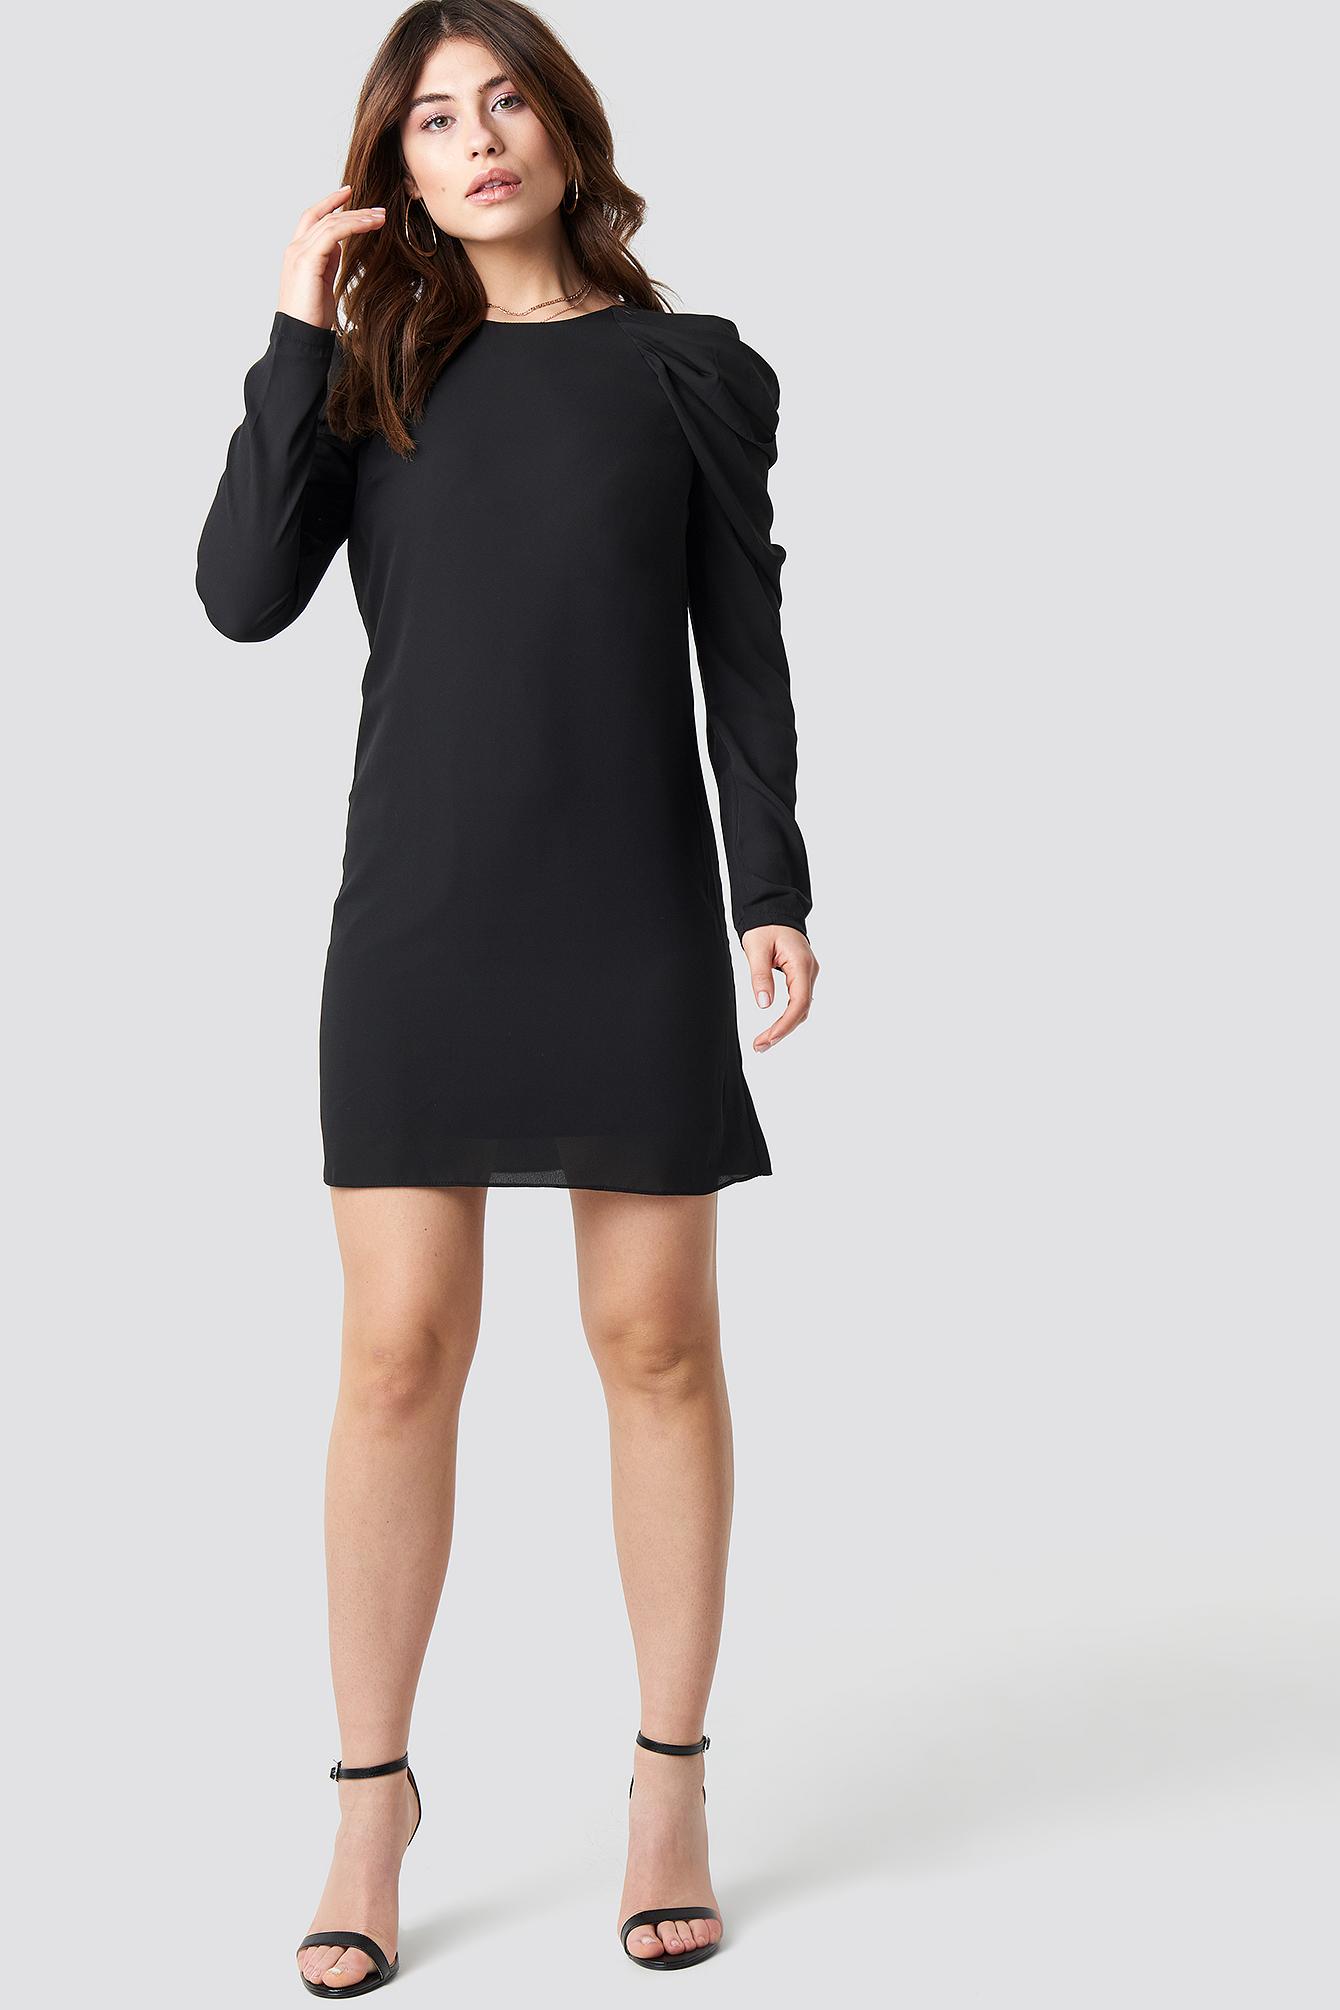 Ruffle Sleeve Mini Dress NA-KD.COM